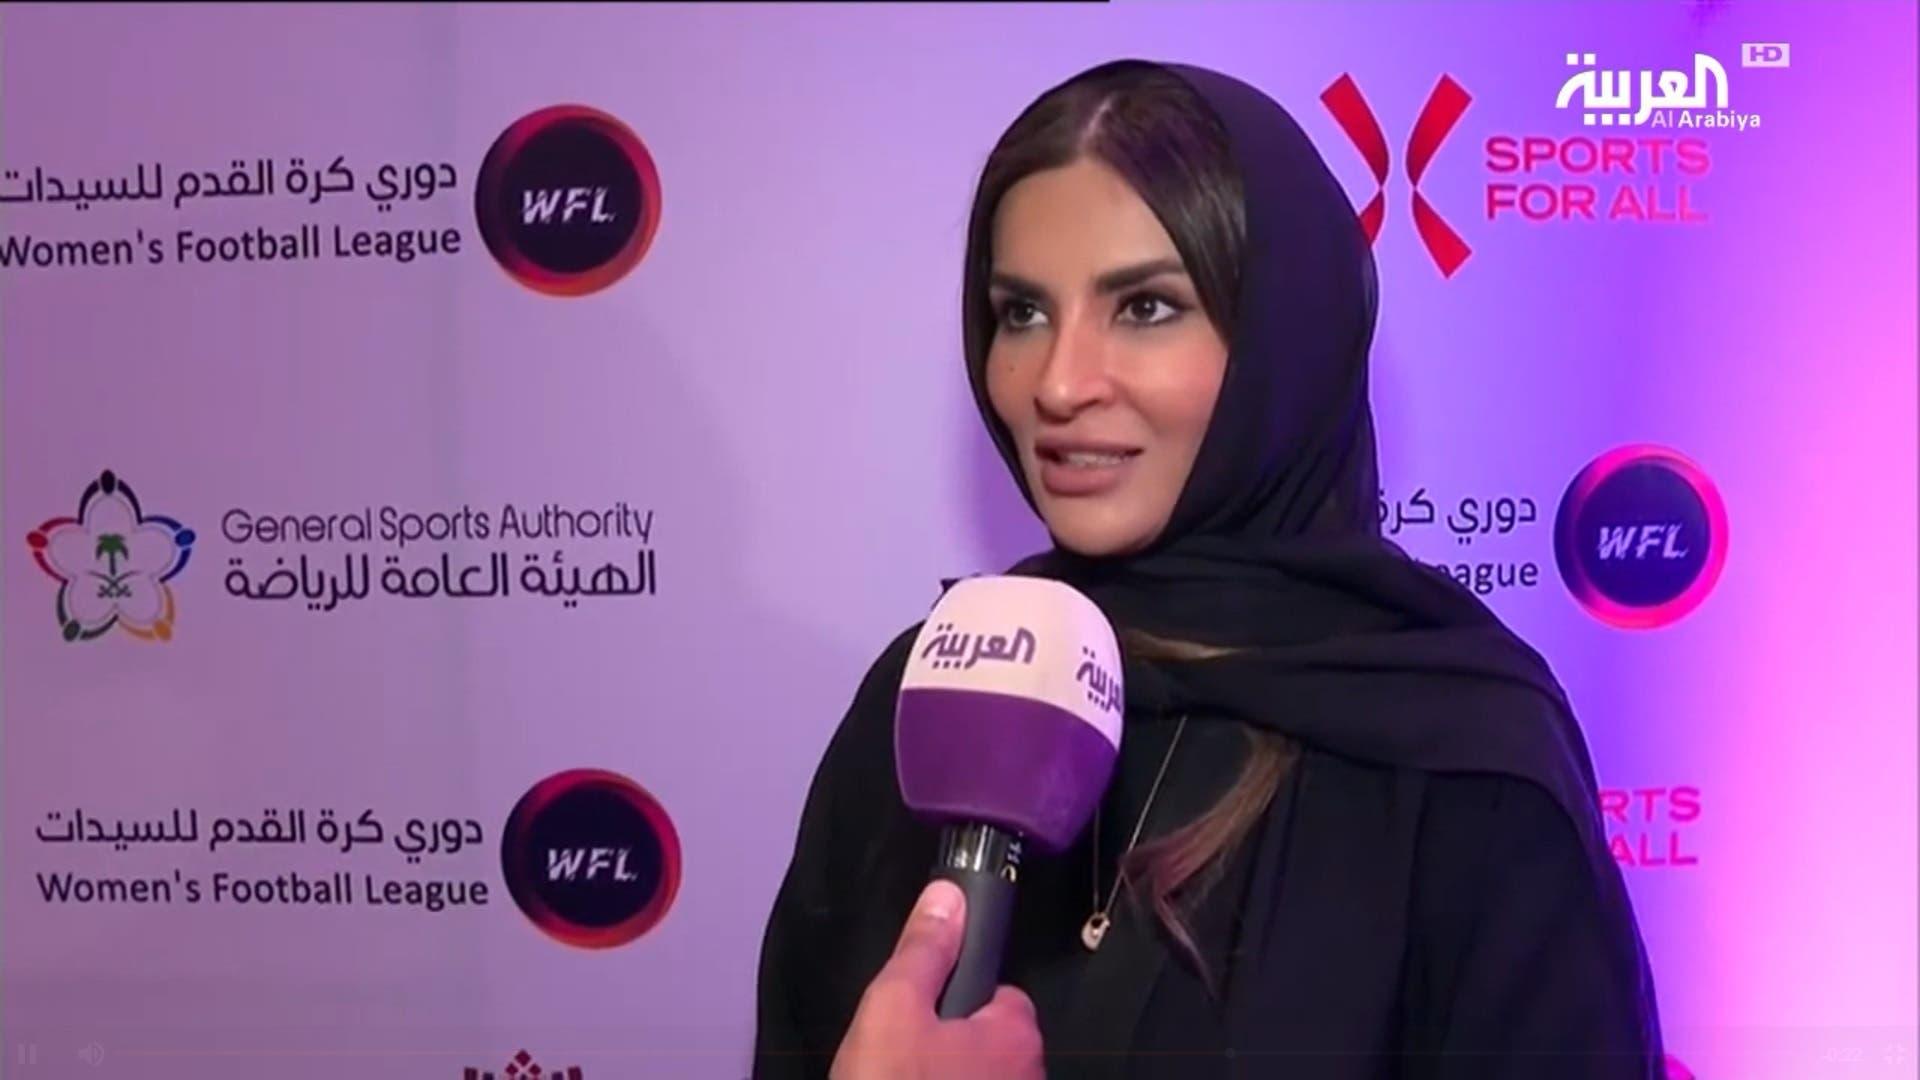 Shaima Saleh al-Husseini Al Arabiya